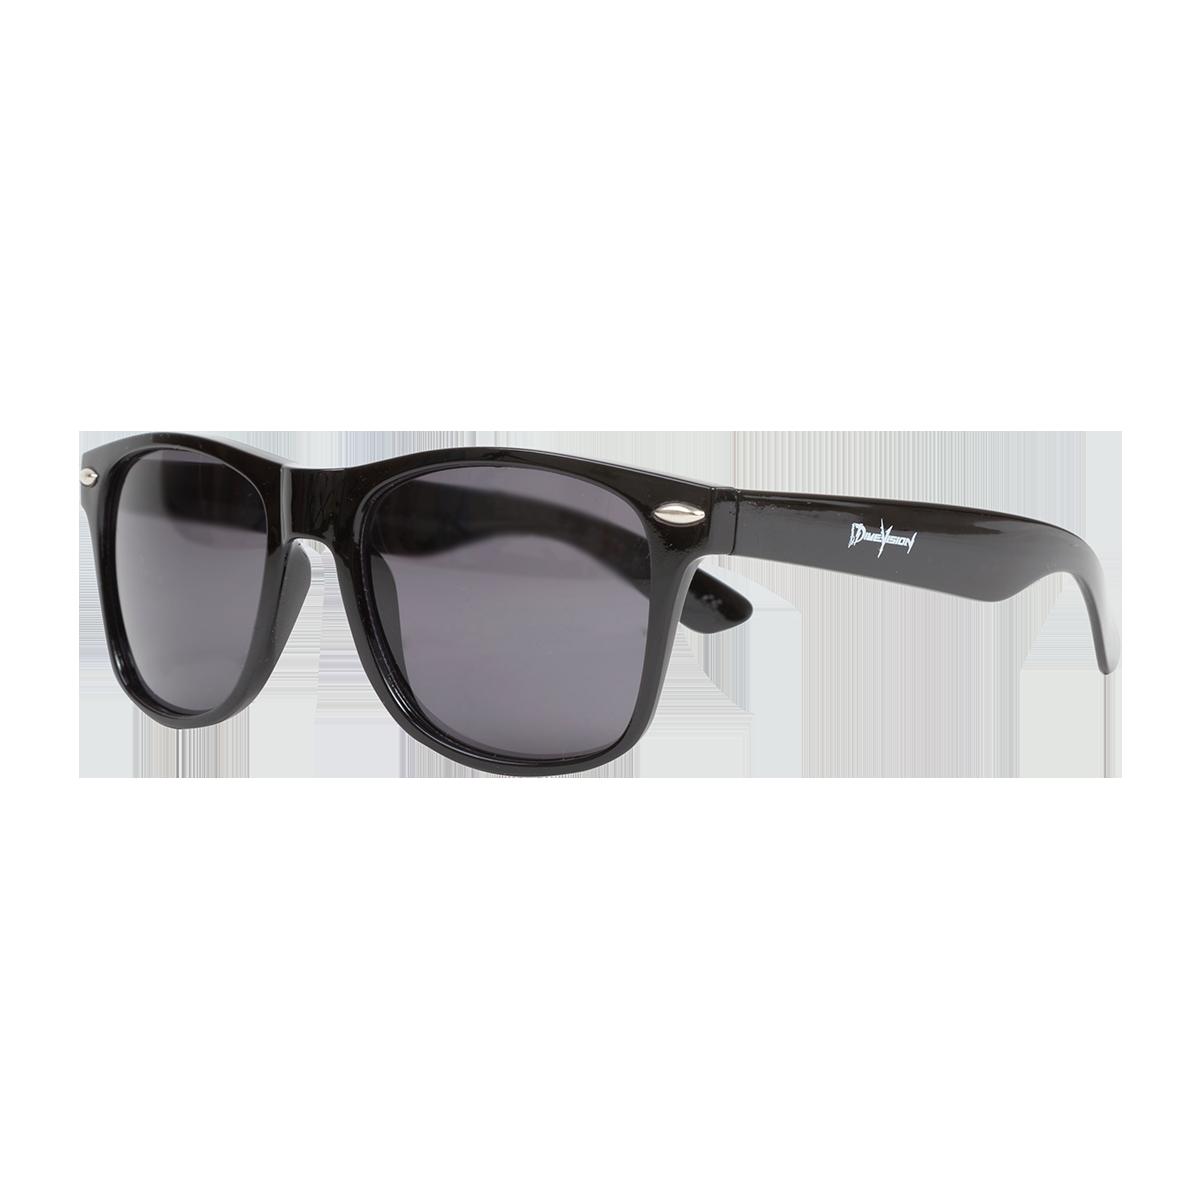 Dimevision Sunglasses